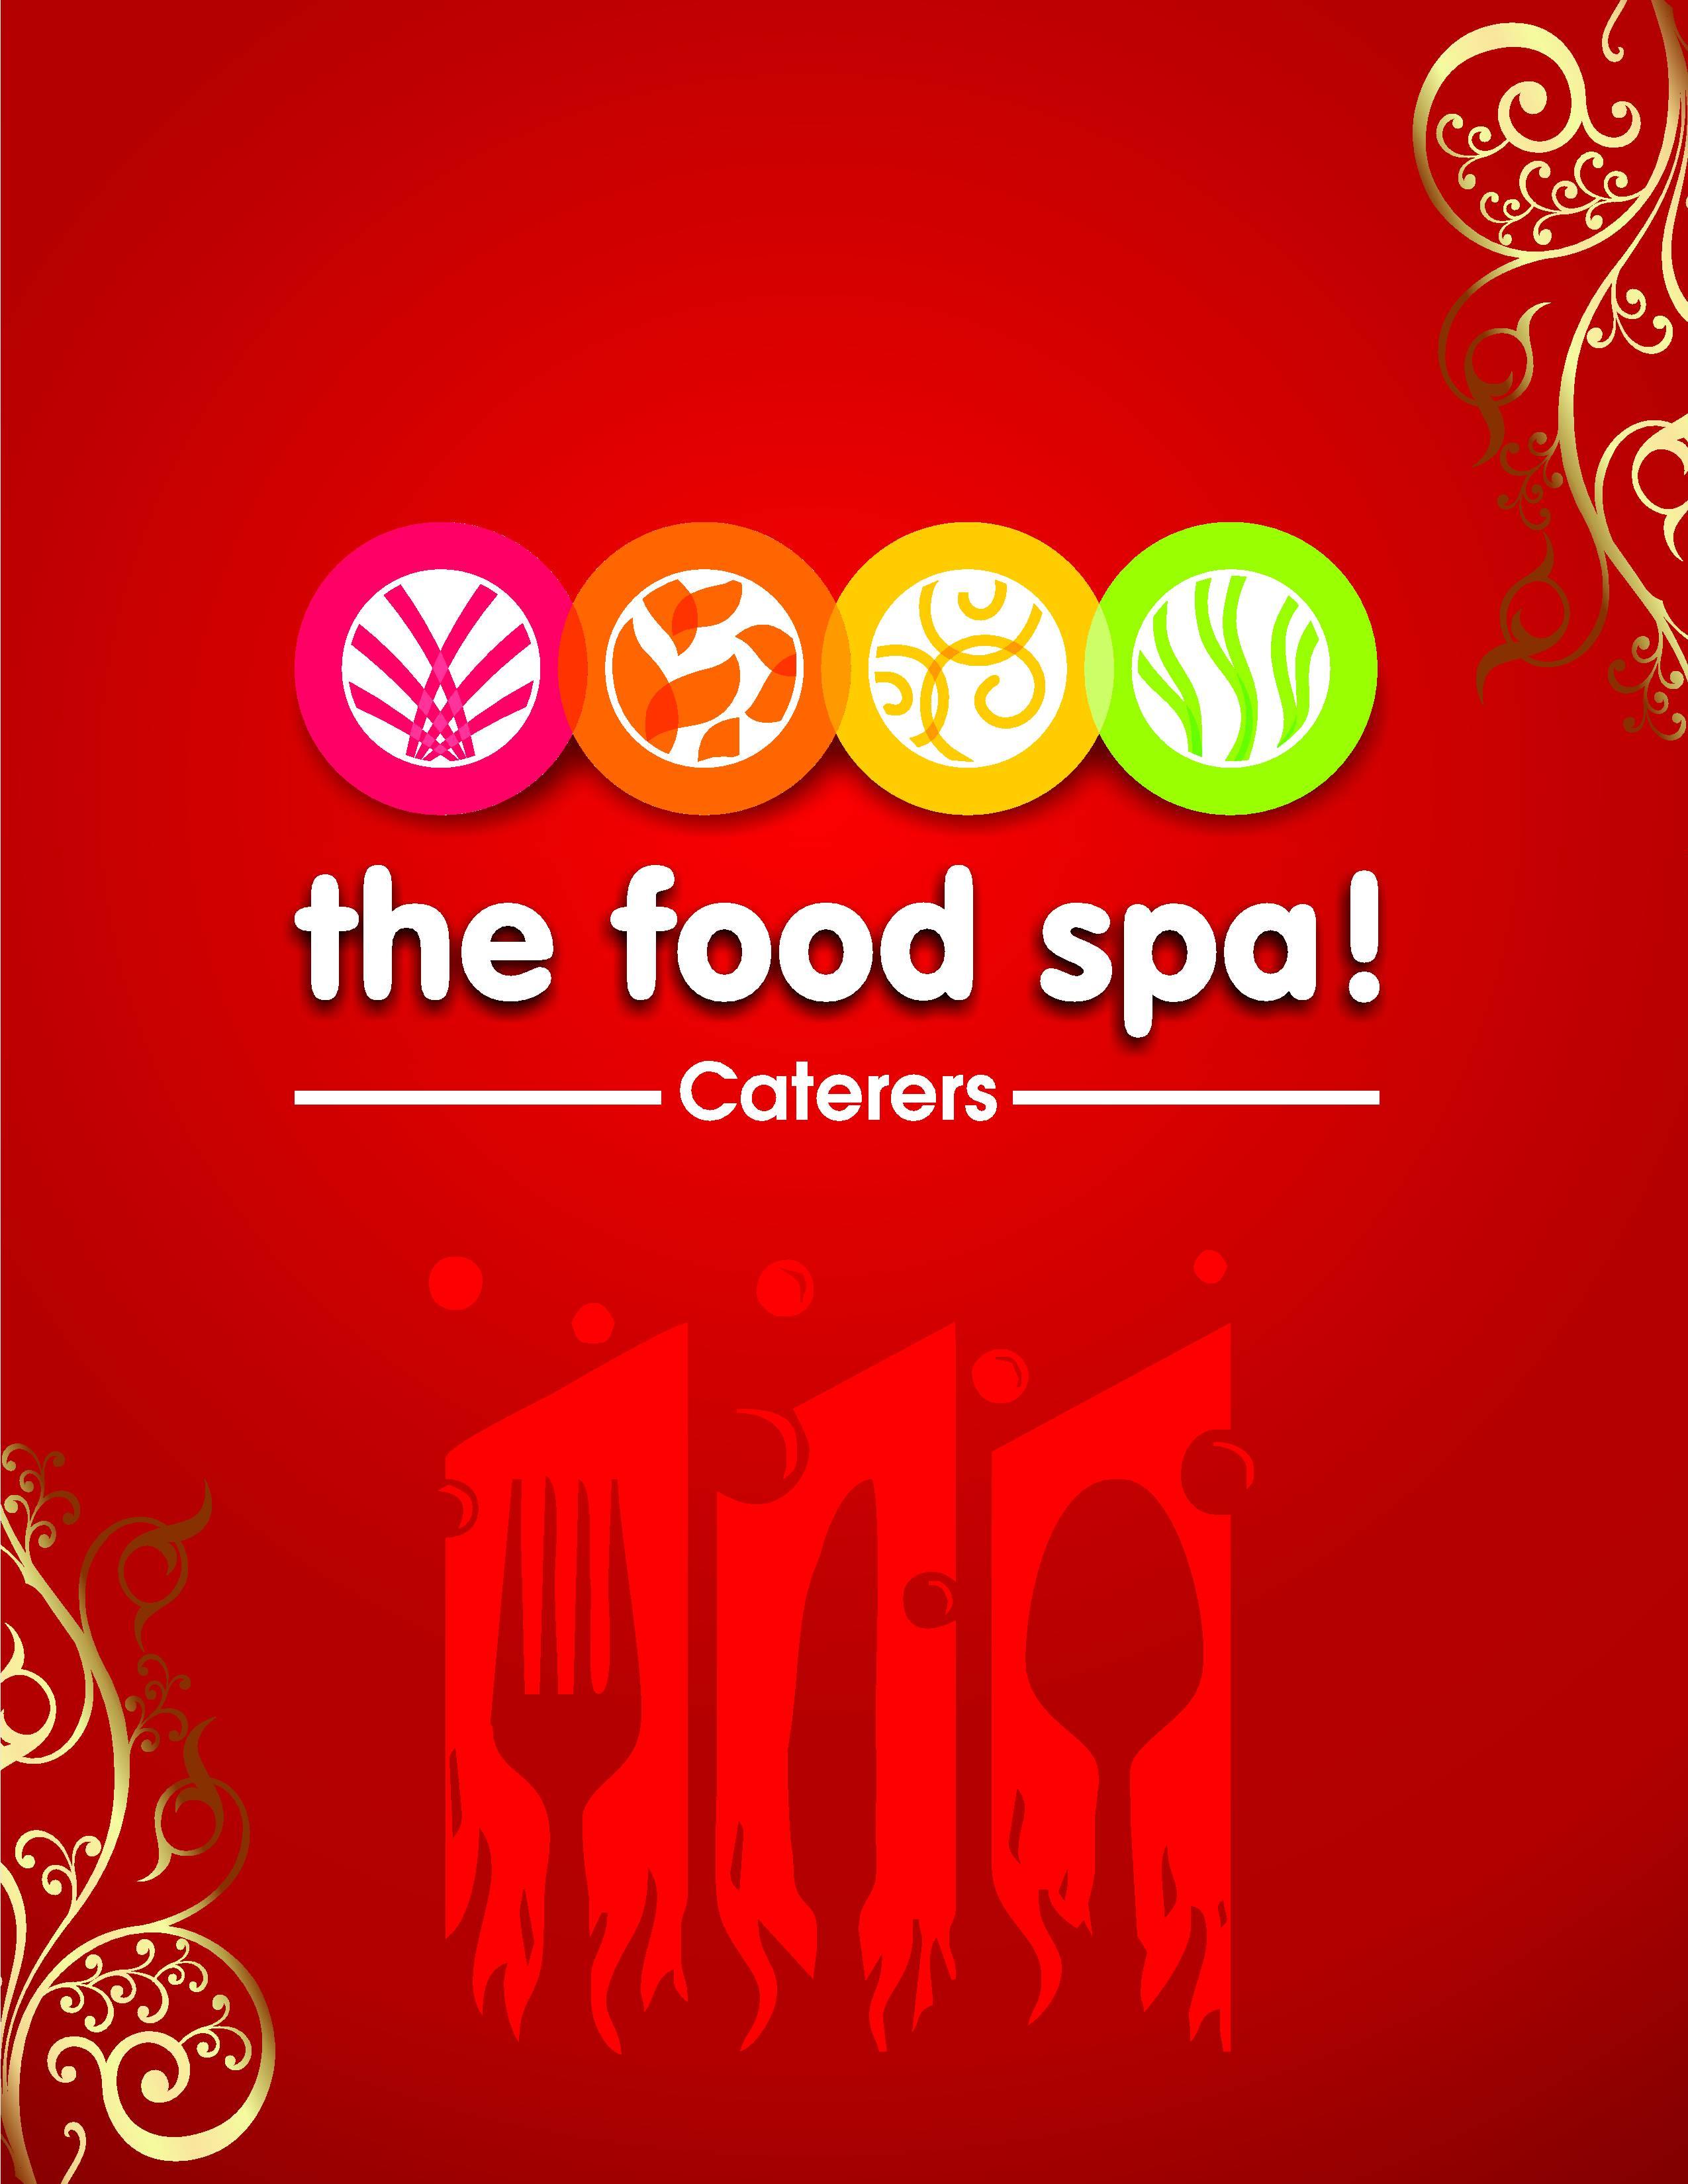 The Food Spa